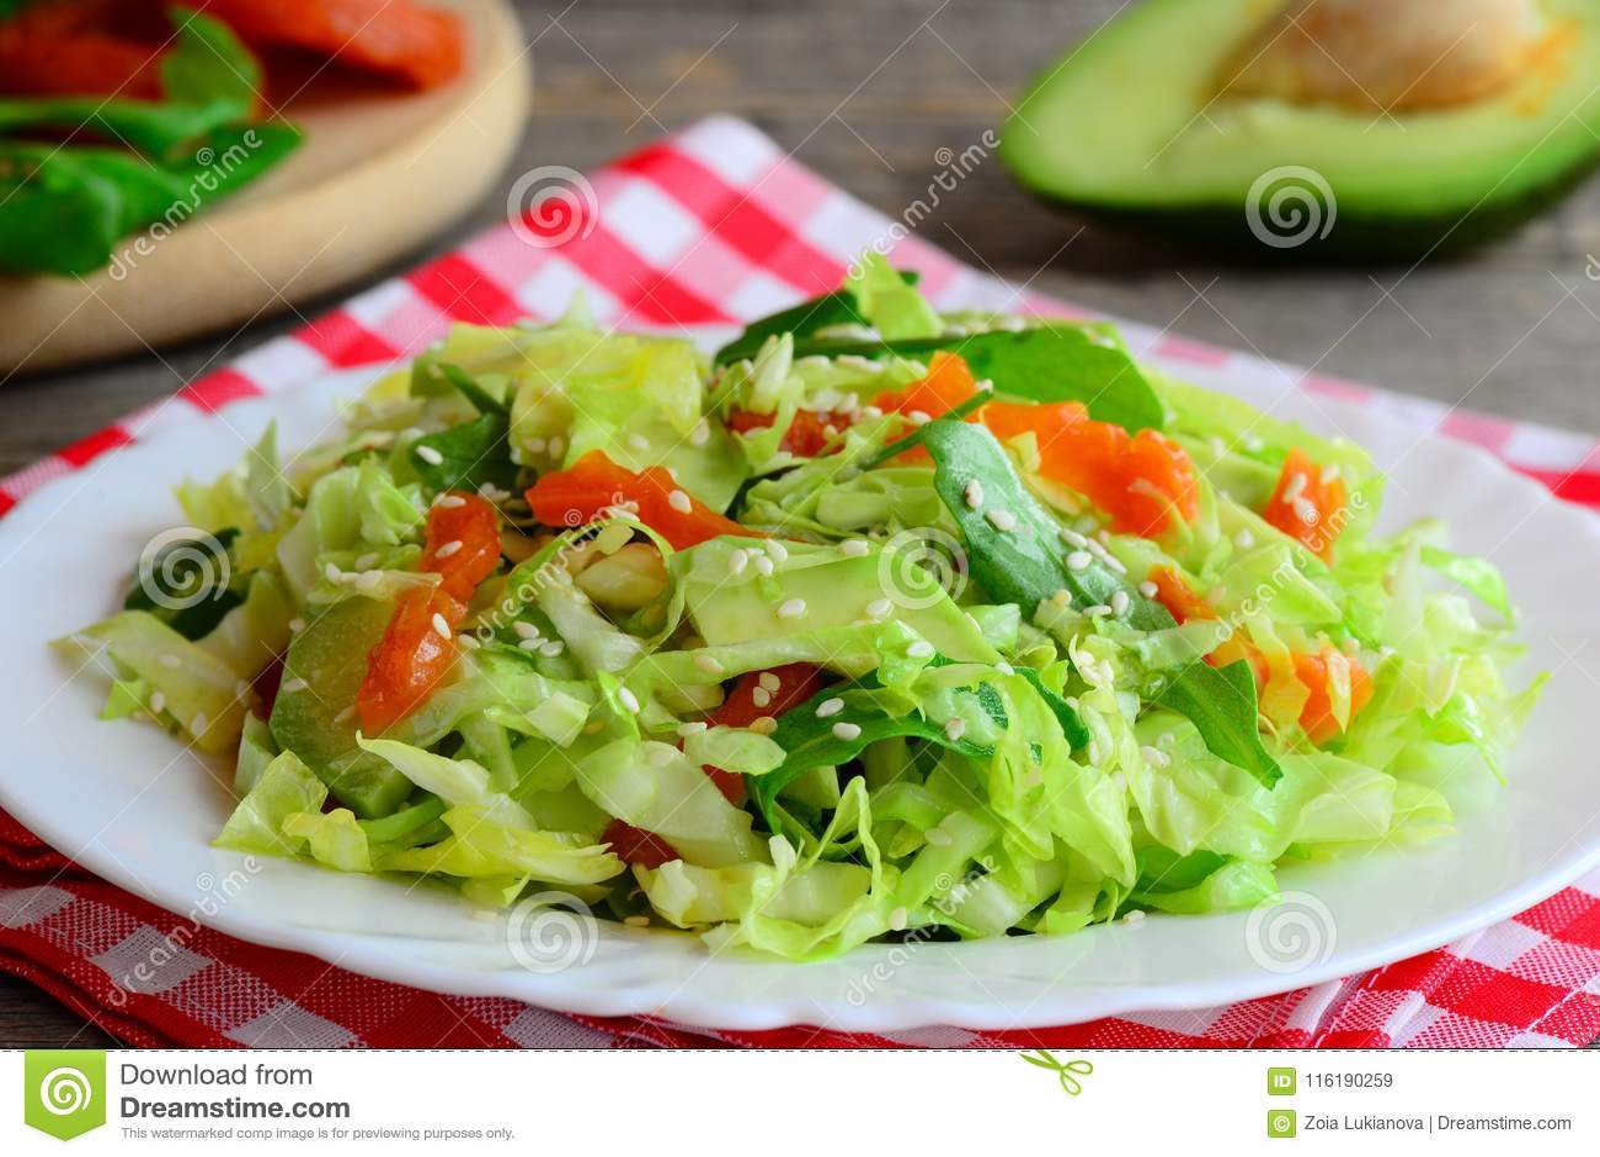 facile dieta vegetariana indiana per perdere peso